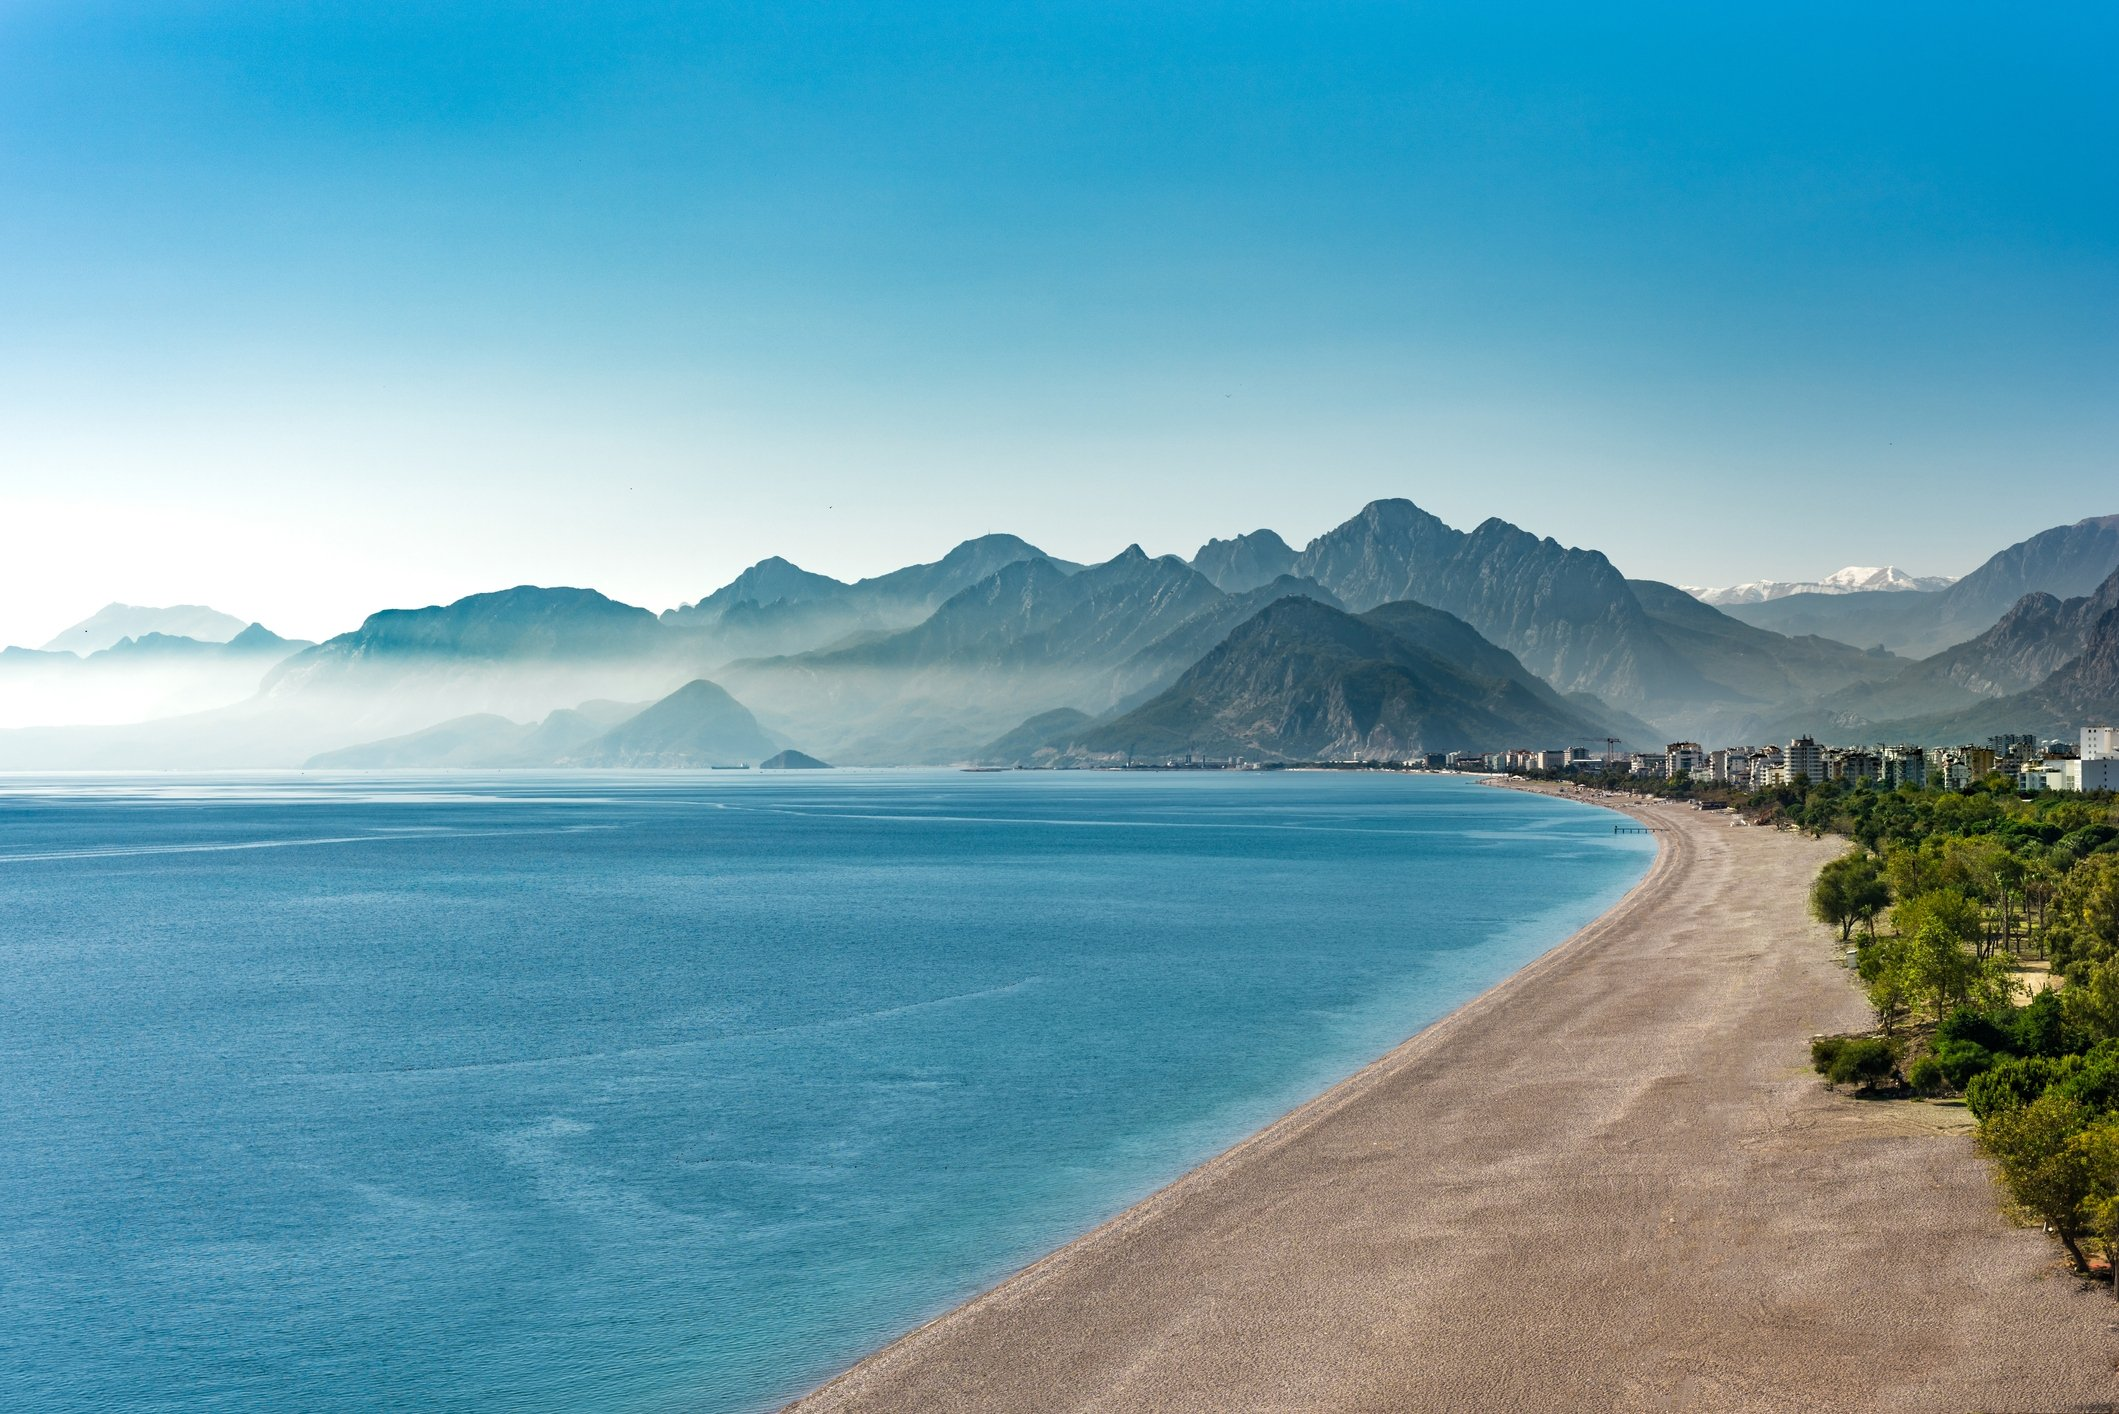 Konyaaltı beach is one of the most popular beaches in Antalya. (iStock Photo)